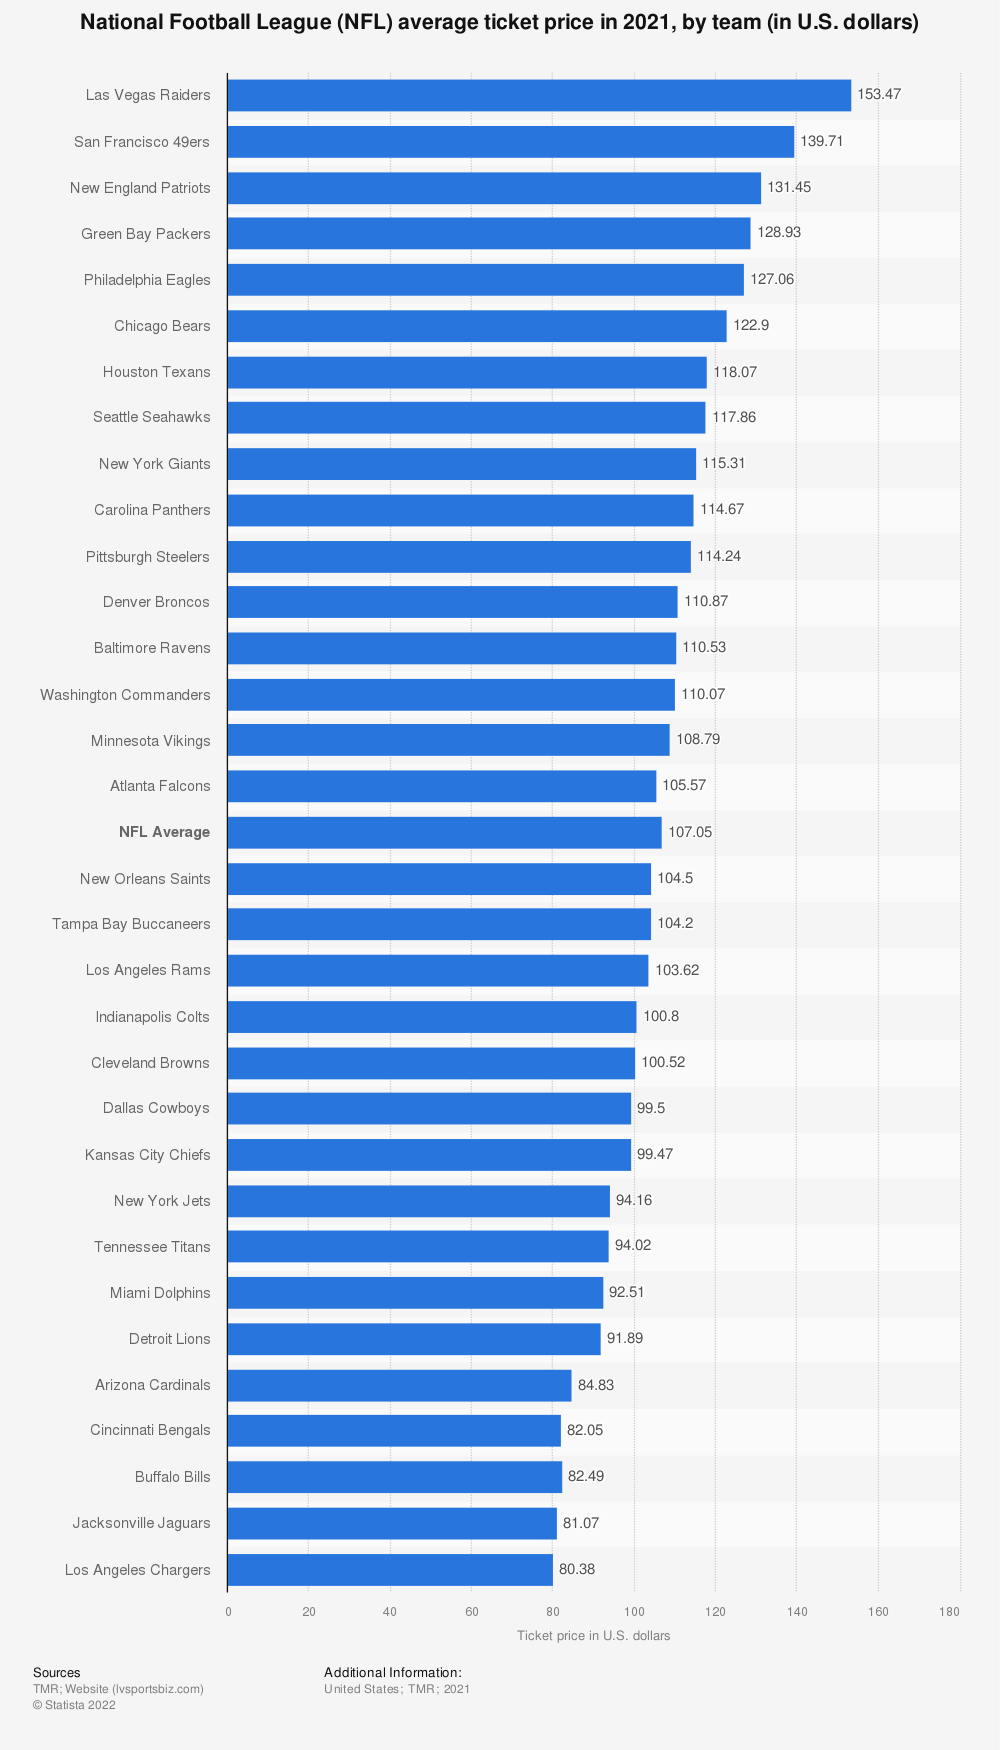 Statistic: National Football League: average ticket price by team in 2014 (in U.S. dollars)* | Statista